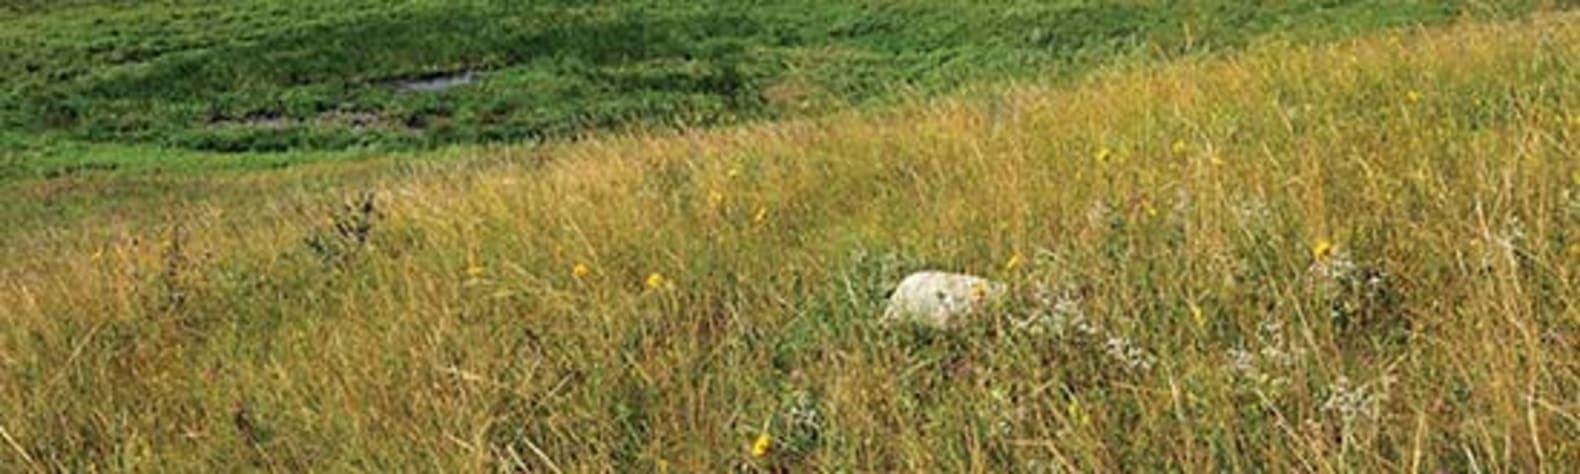 Dakota Prairie National Grassland